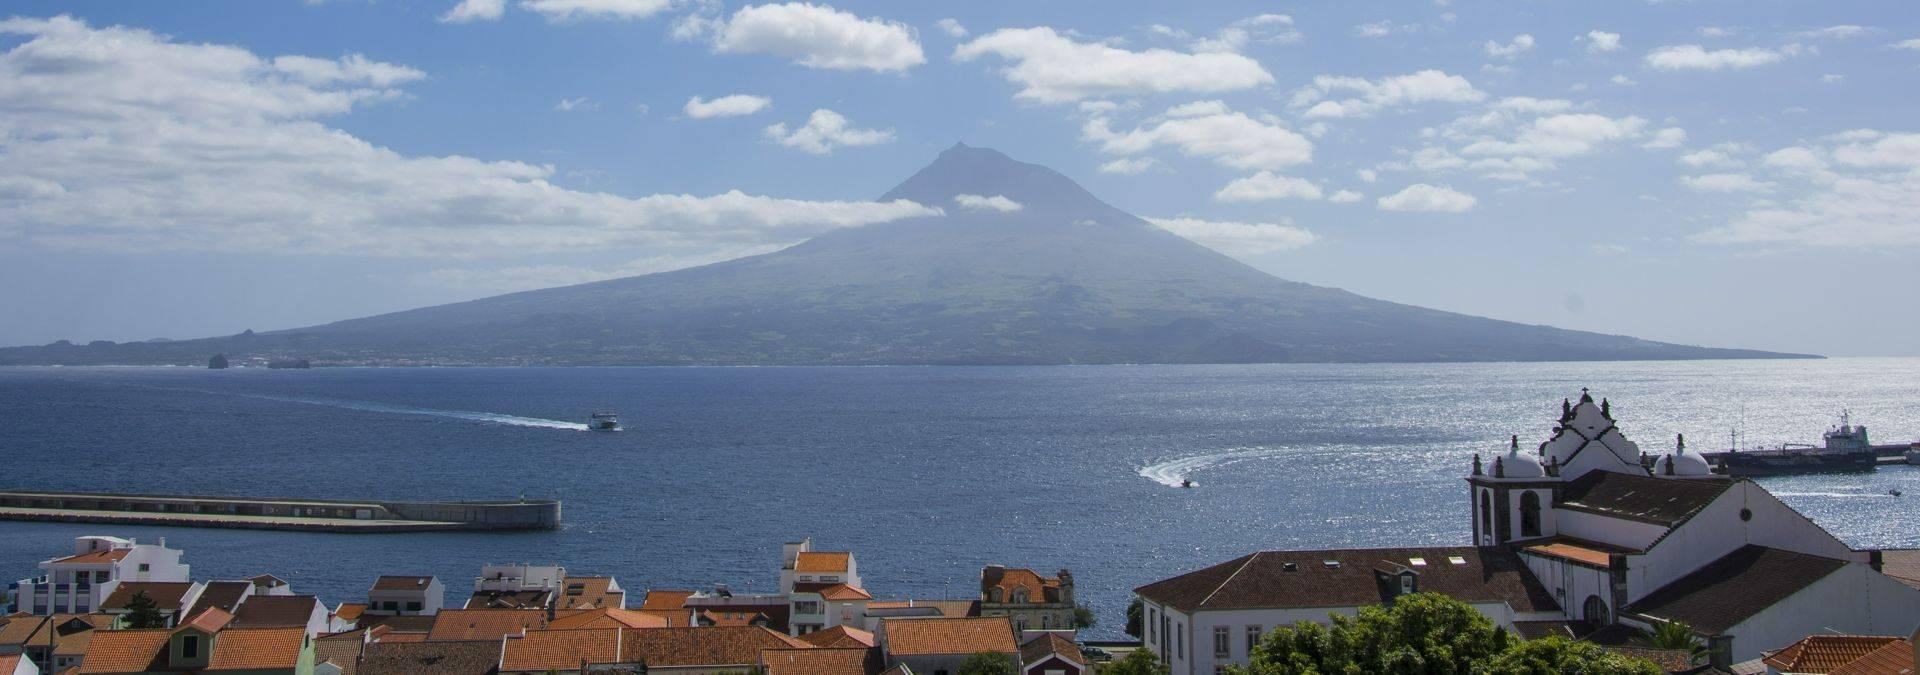 Faial, The Azores. Credit: Futurismo Azores Adventure